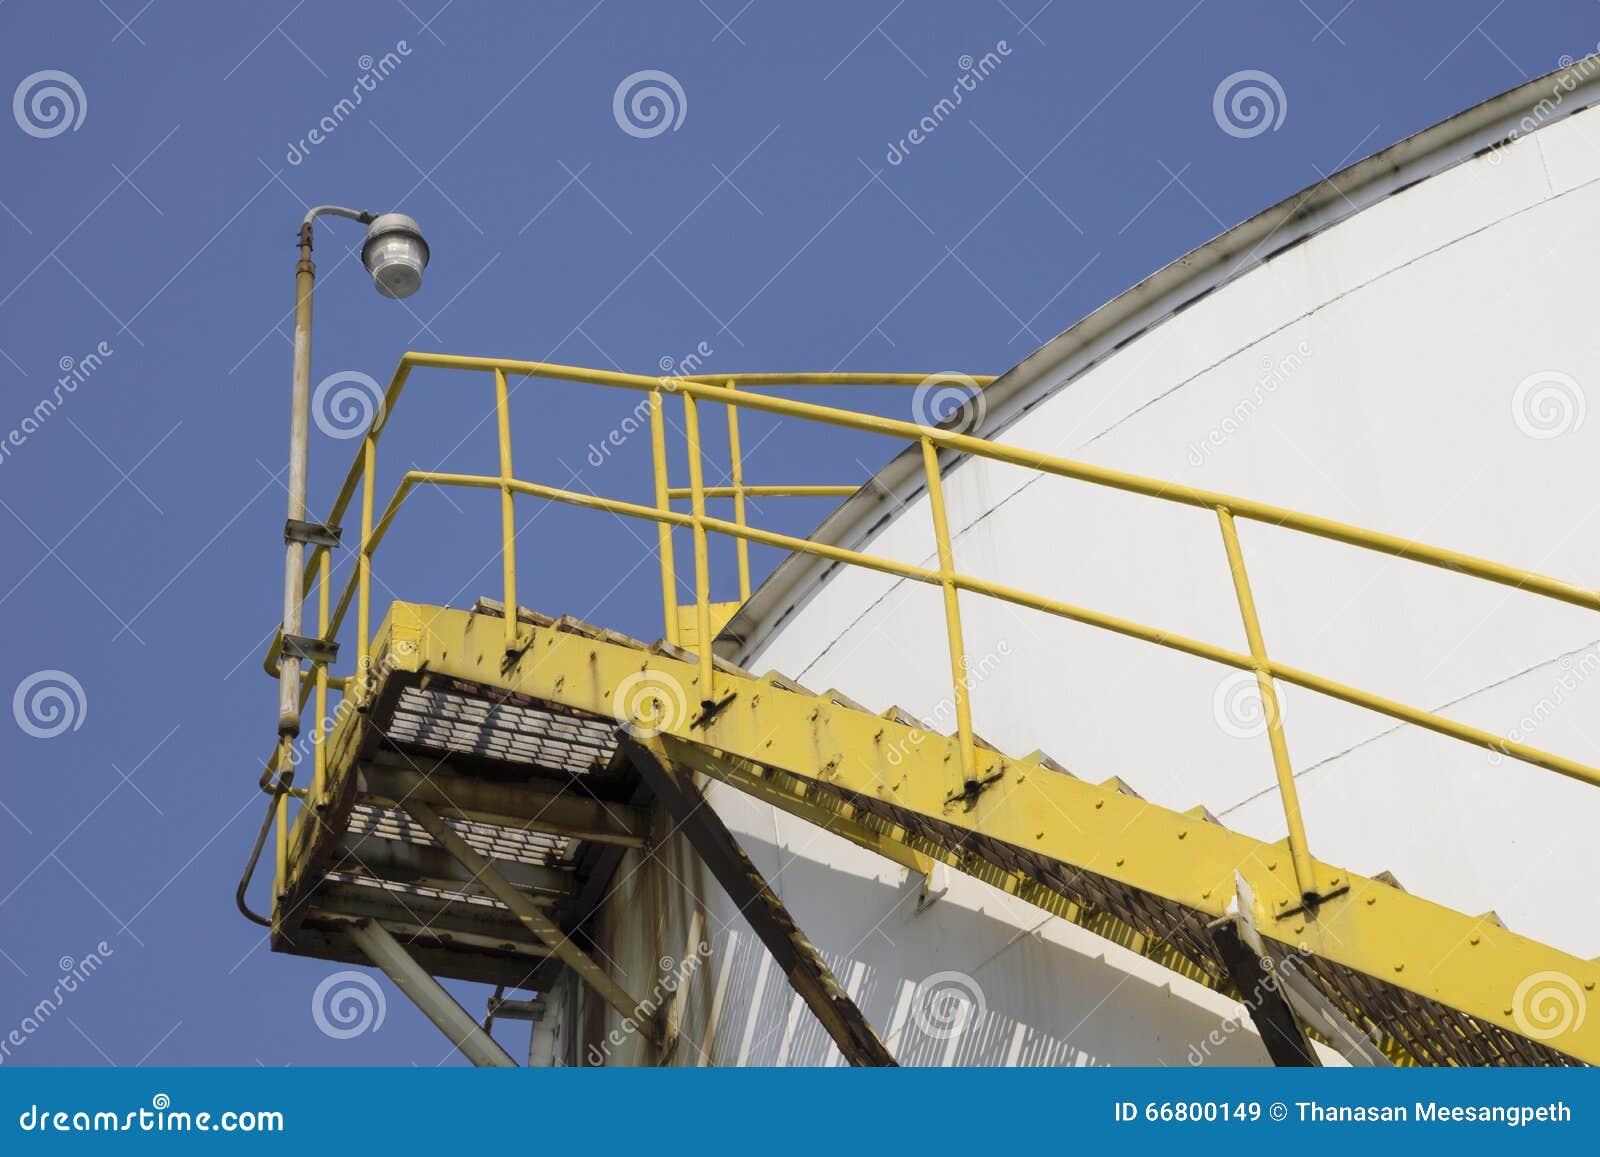 Water Tank Stairs : Tank stair stock photo image